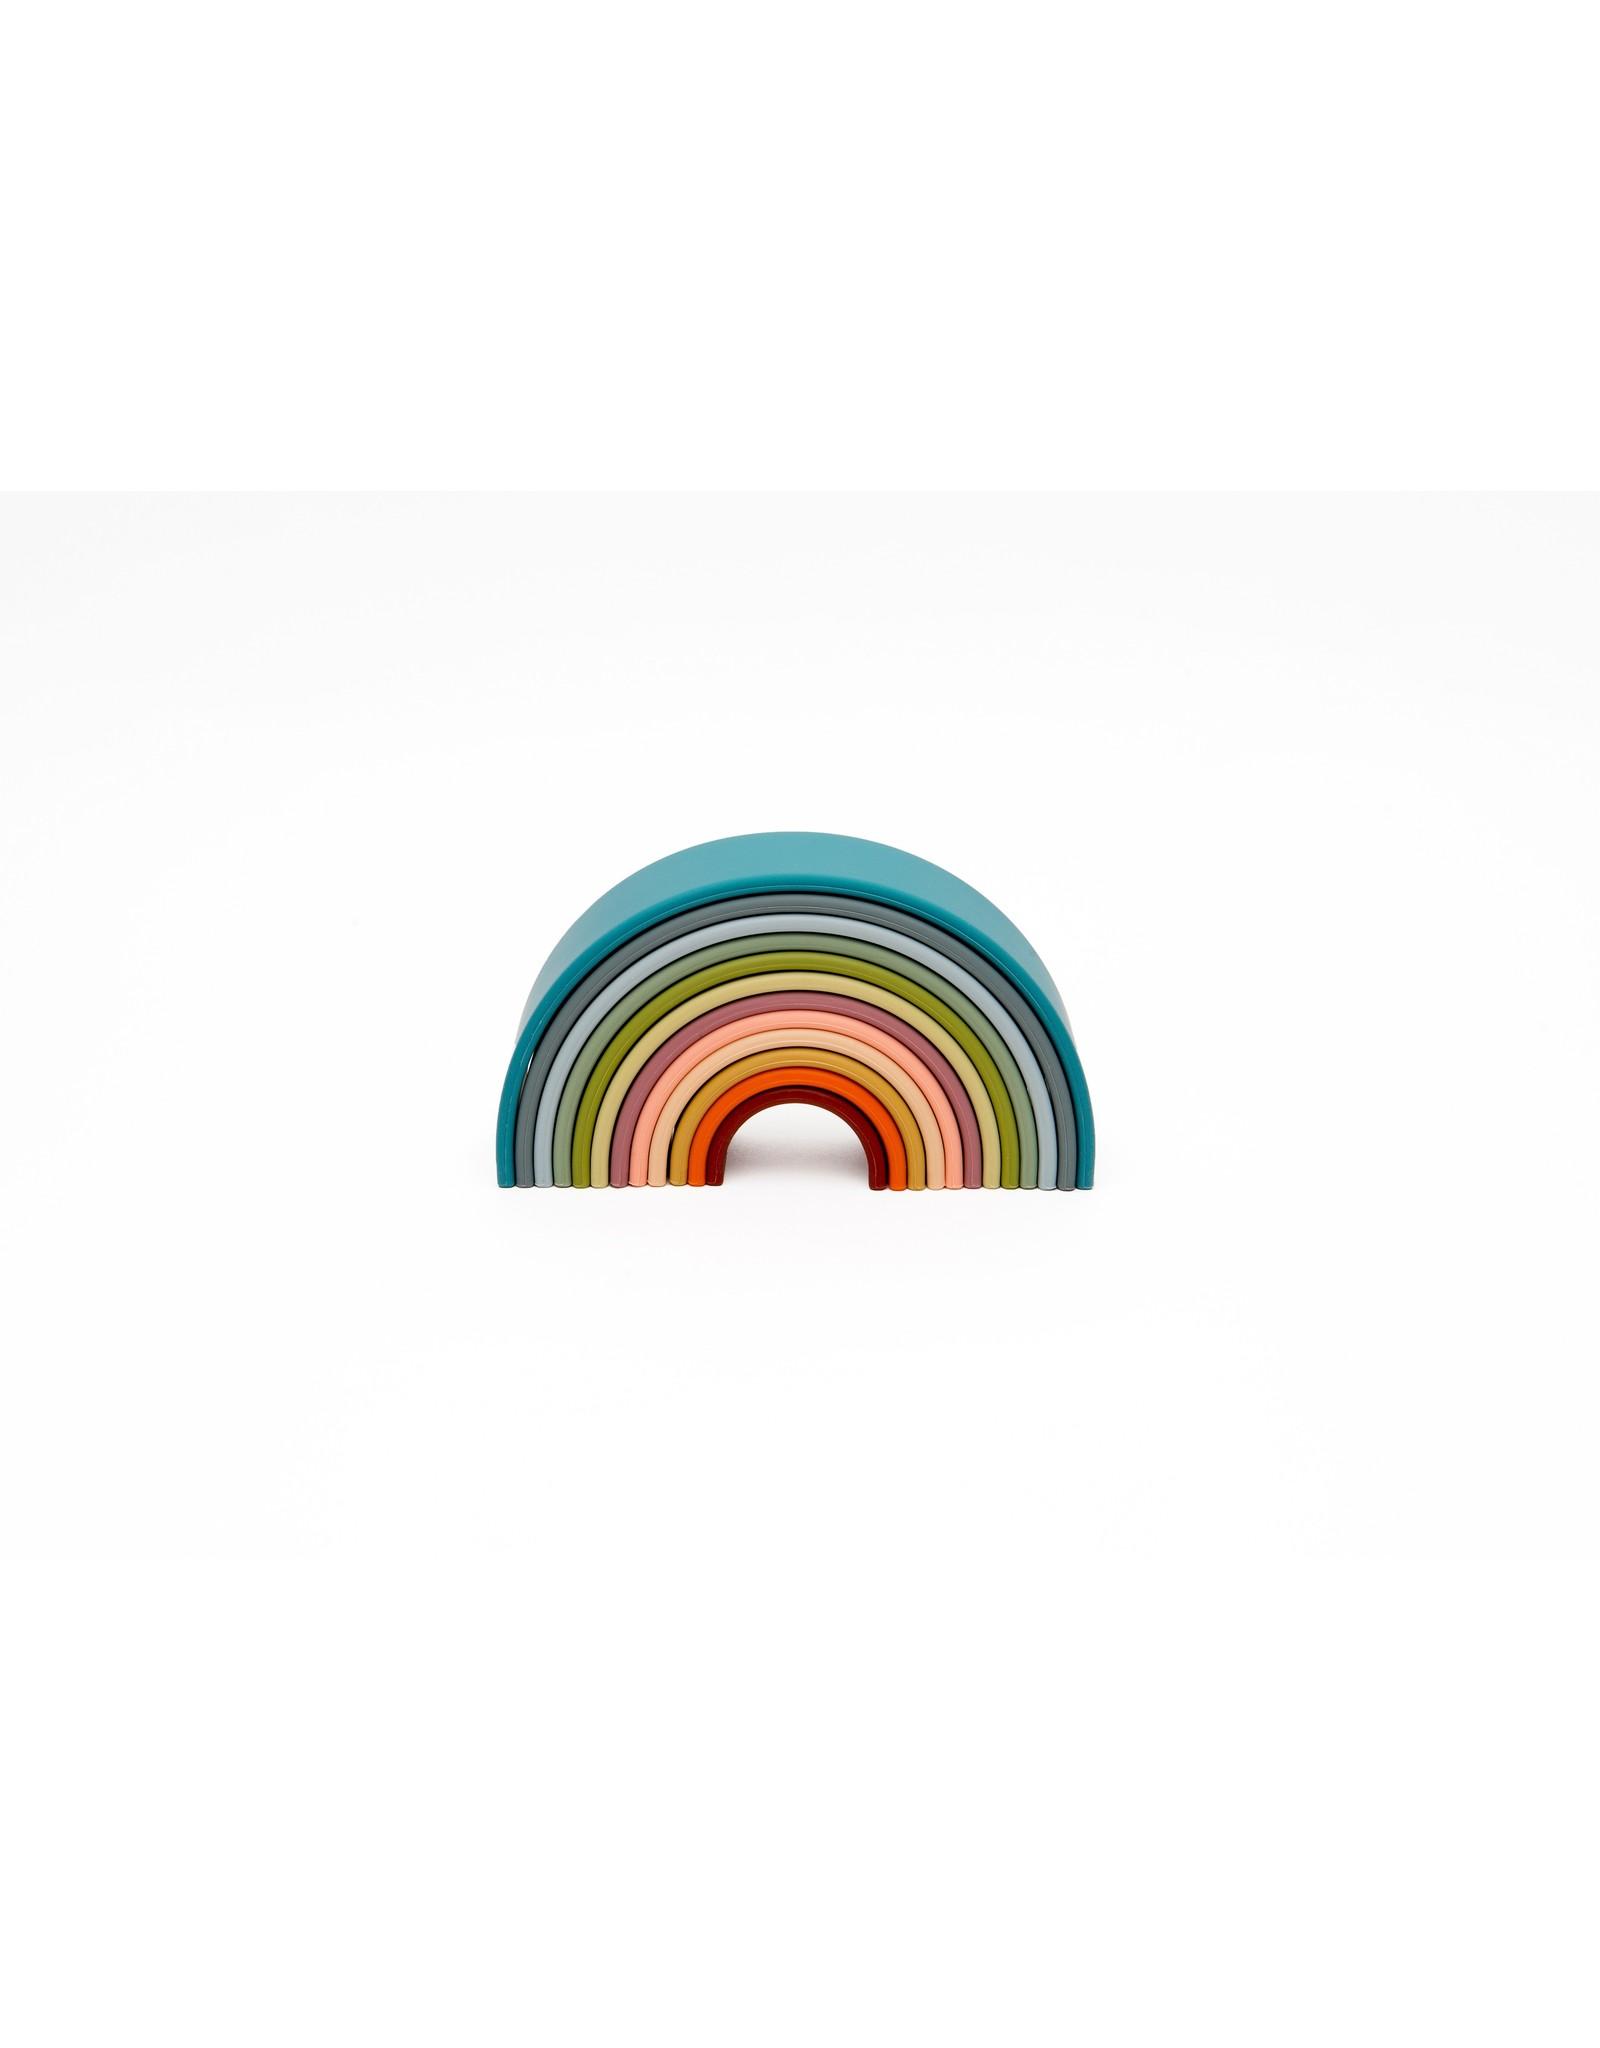 Dena Arc en ciel - teether - Nature 12 pieces